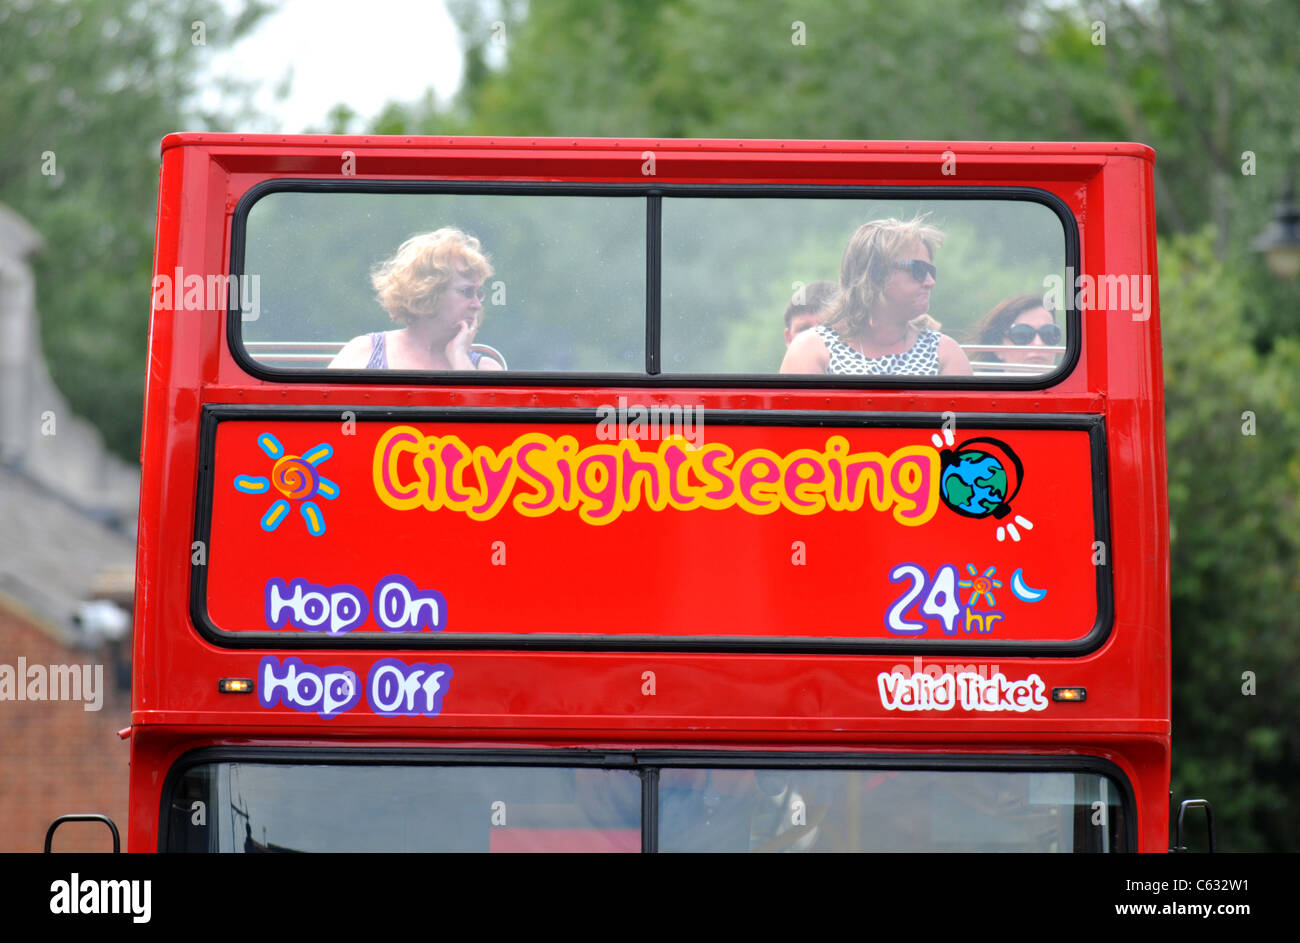 El autobús de recorrido turístico, Eton, Berkshire, Inglaterra, Reino Unido Imagen De Stock